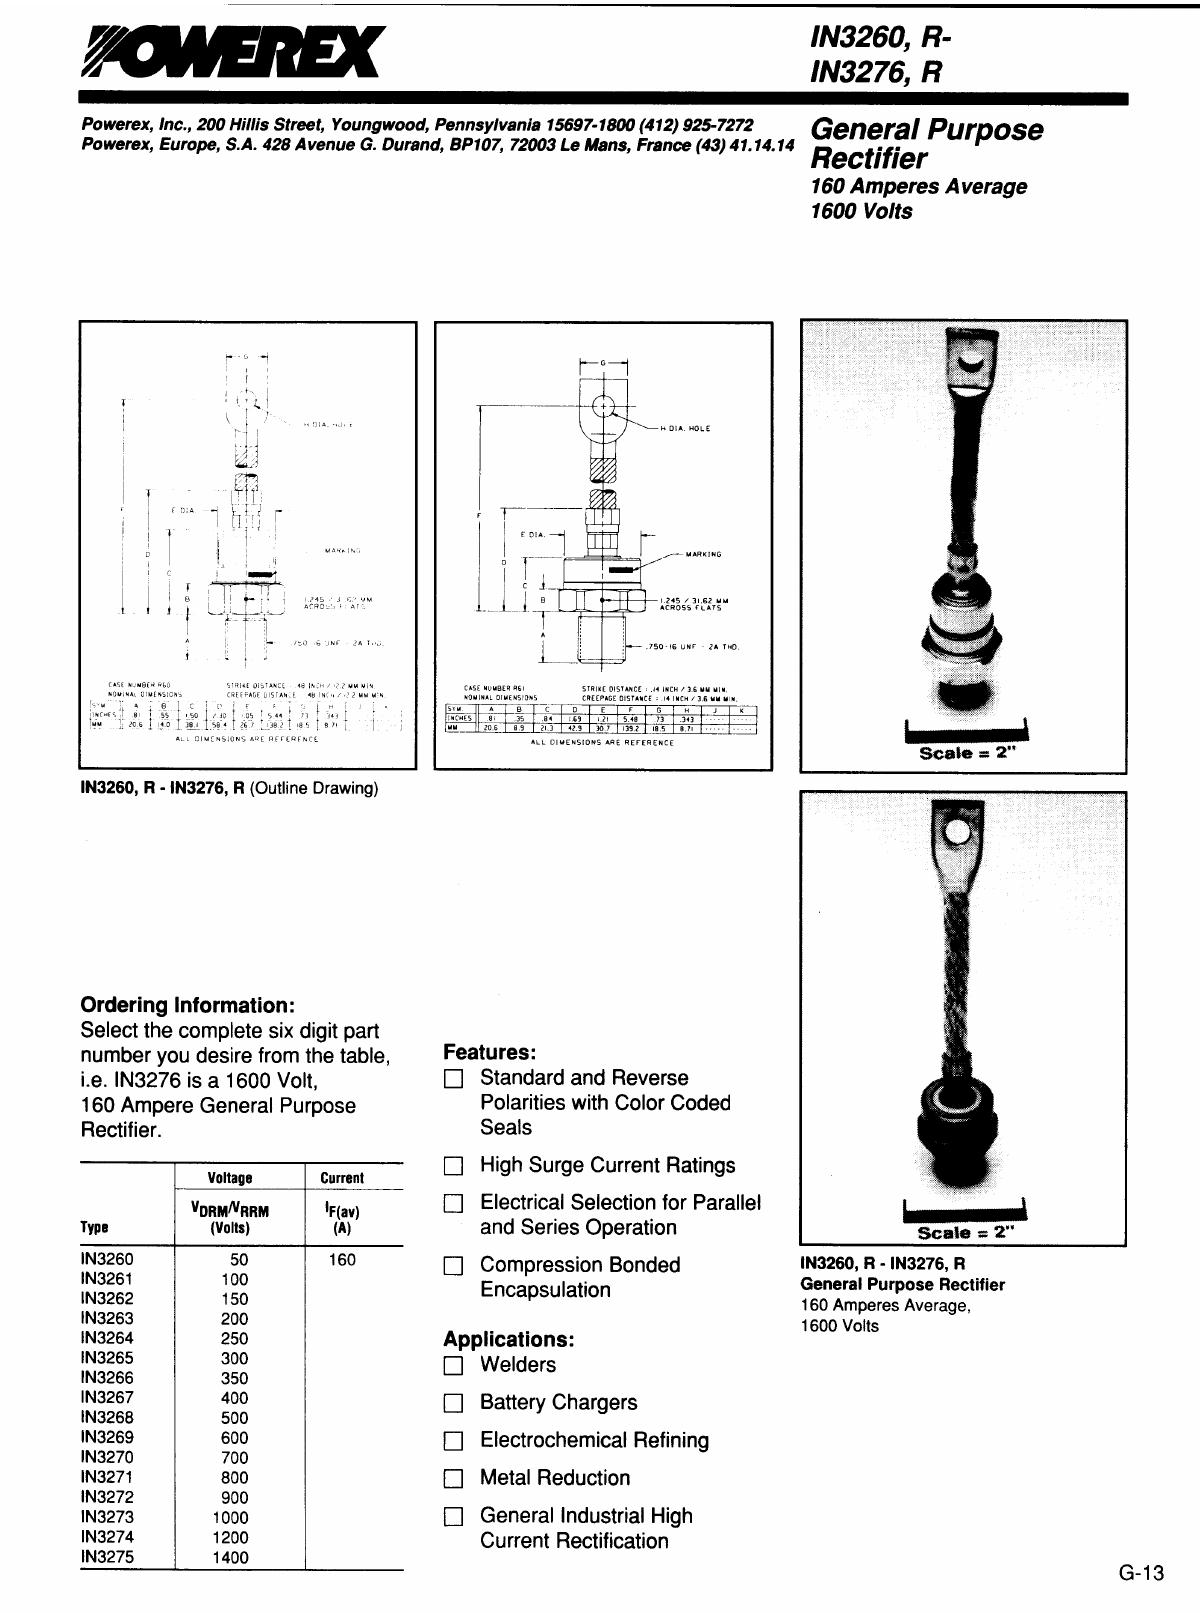 R-IN3274 datasheet